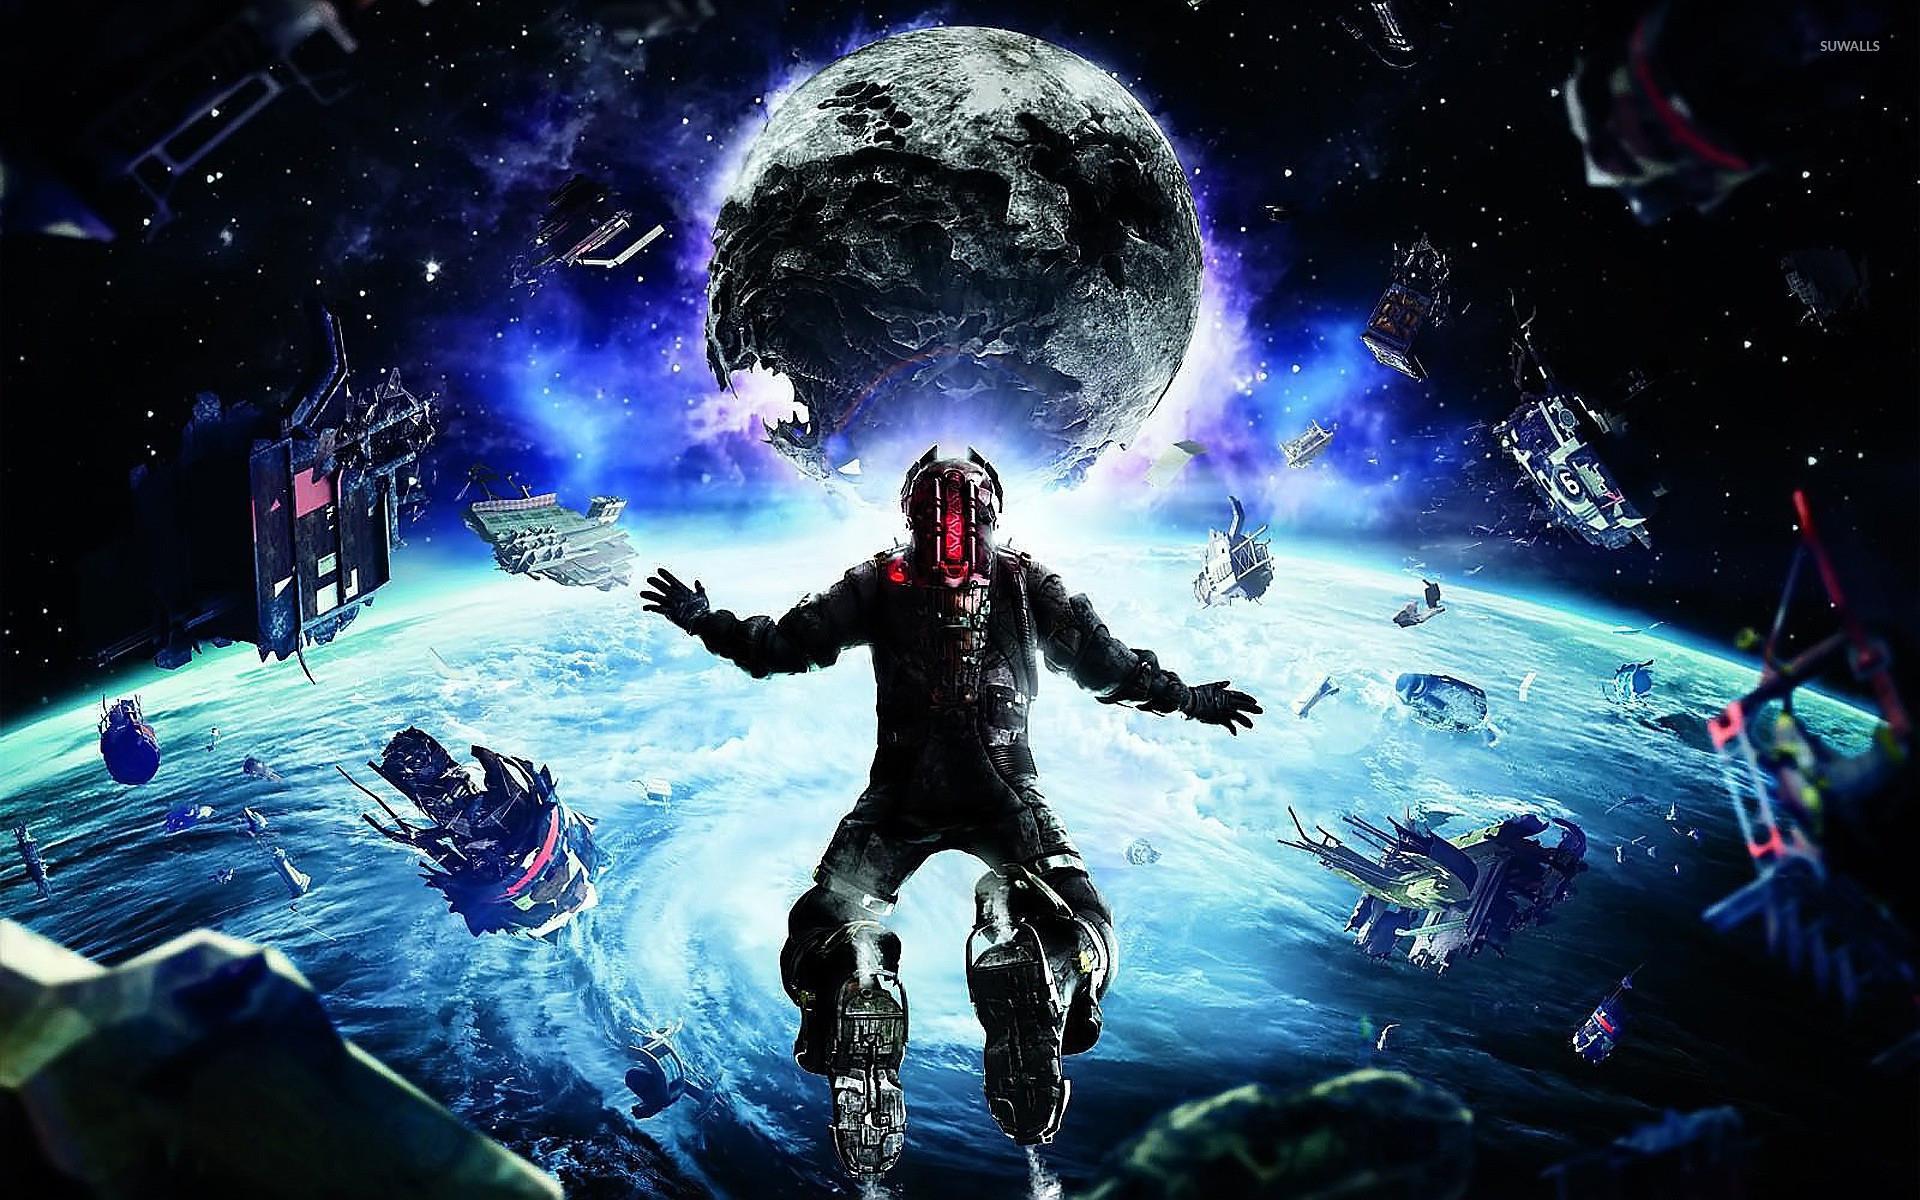 Dead Space Wallpaper 79 images